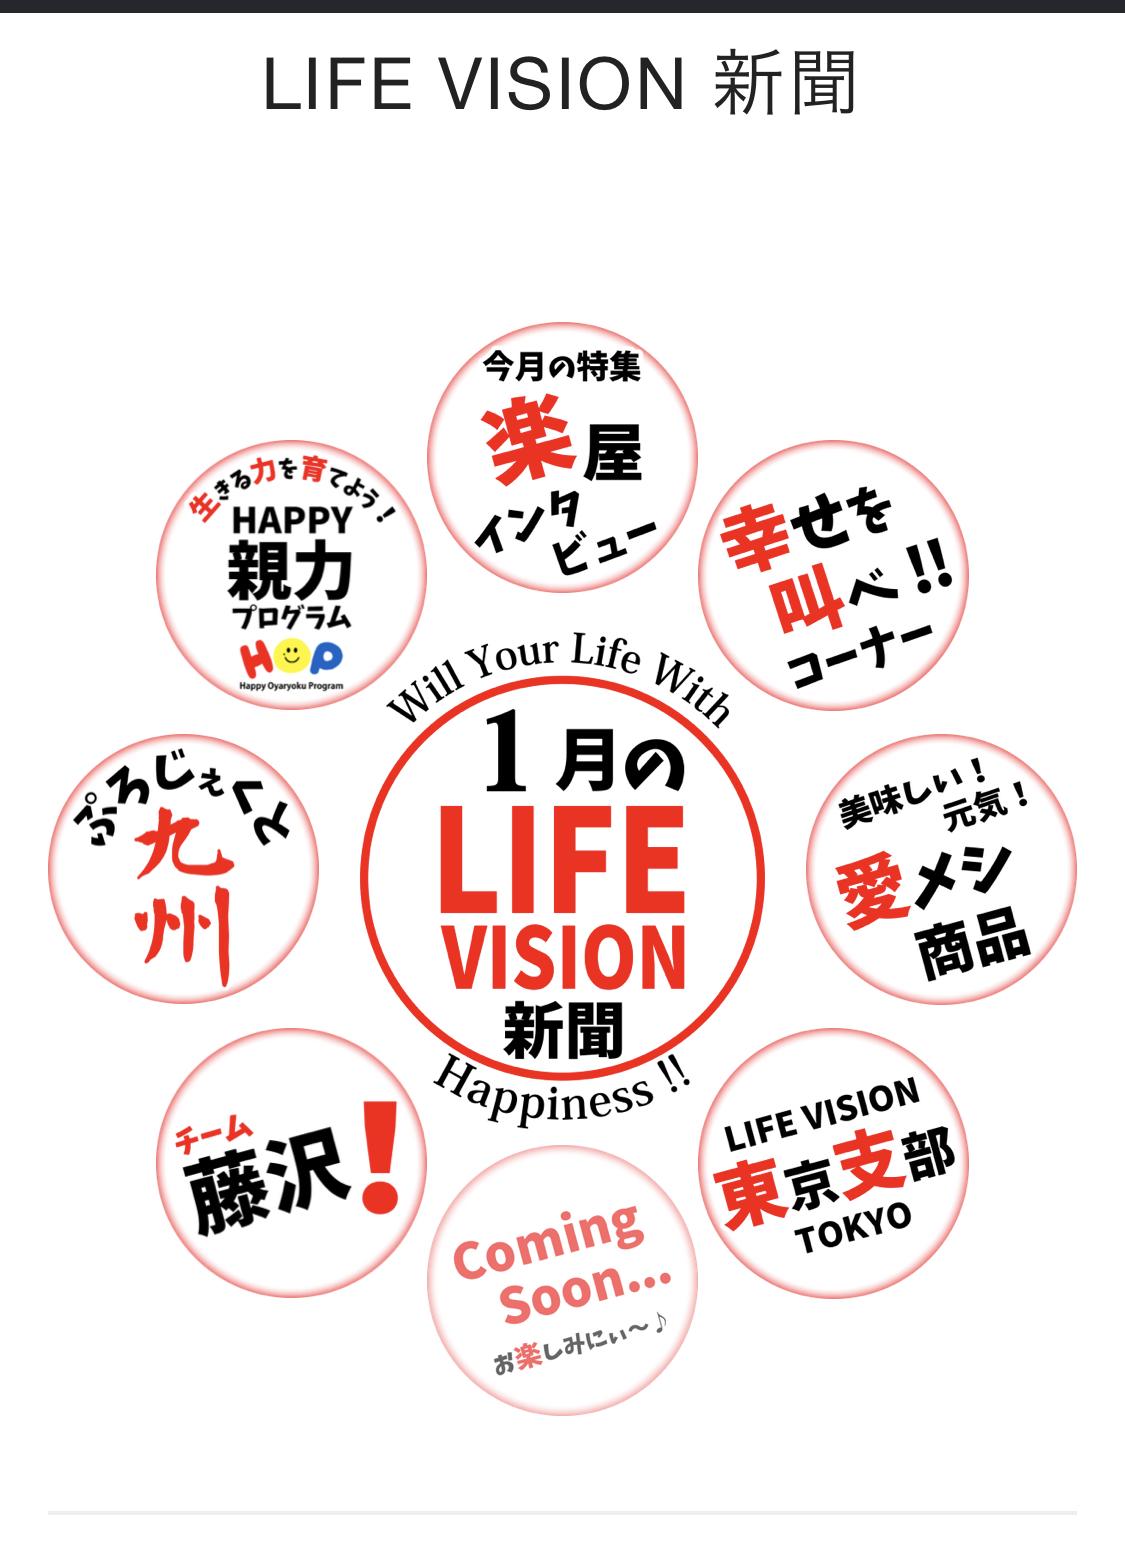 LIFE VISION 新聞✨ 登場〜✨❣️